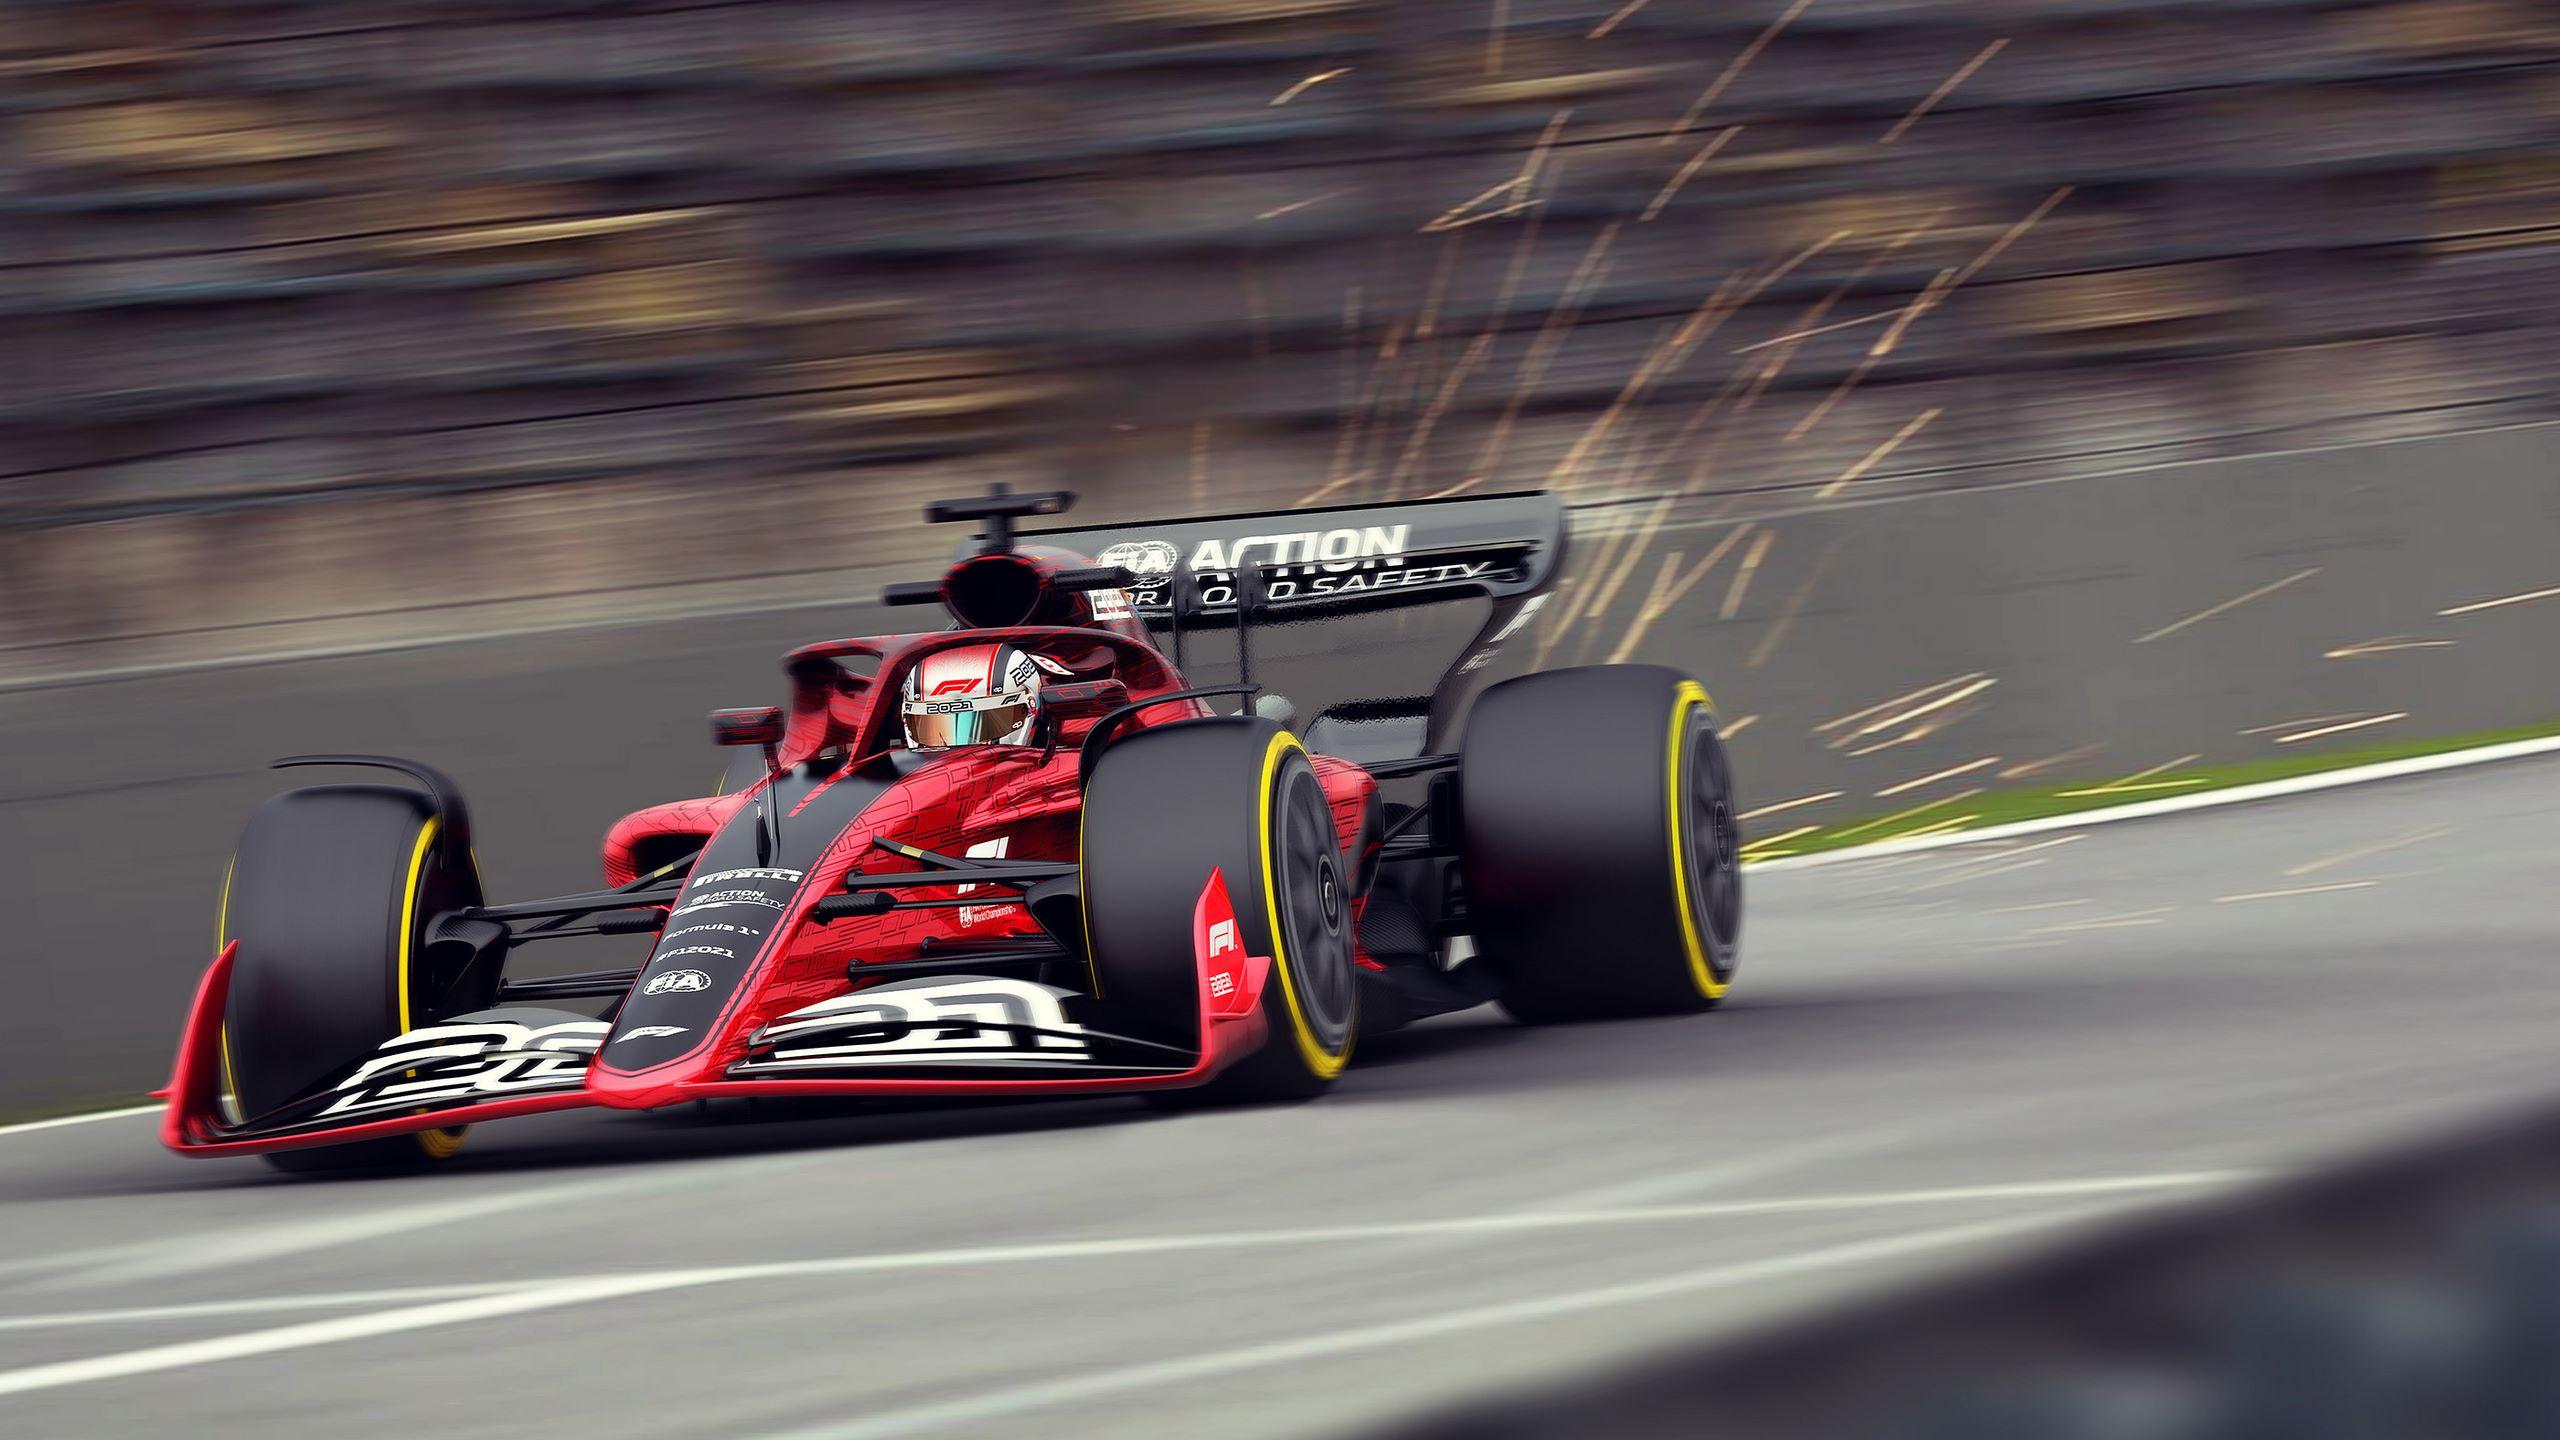 2021-formula-1-race-car-rendering f1 (4)